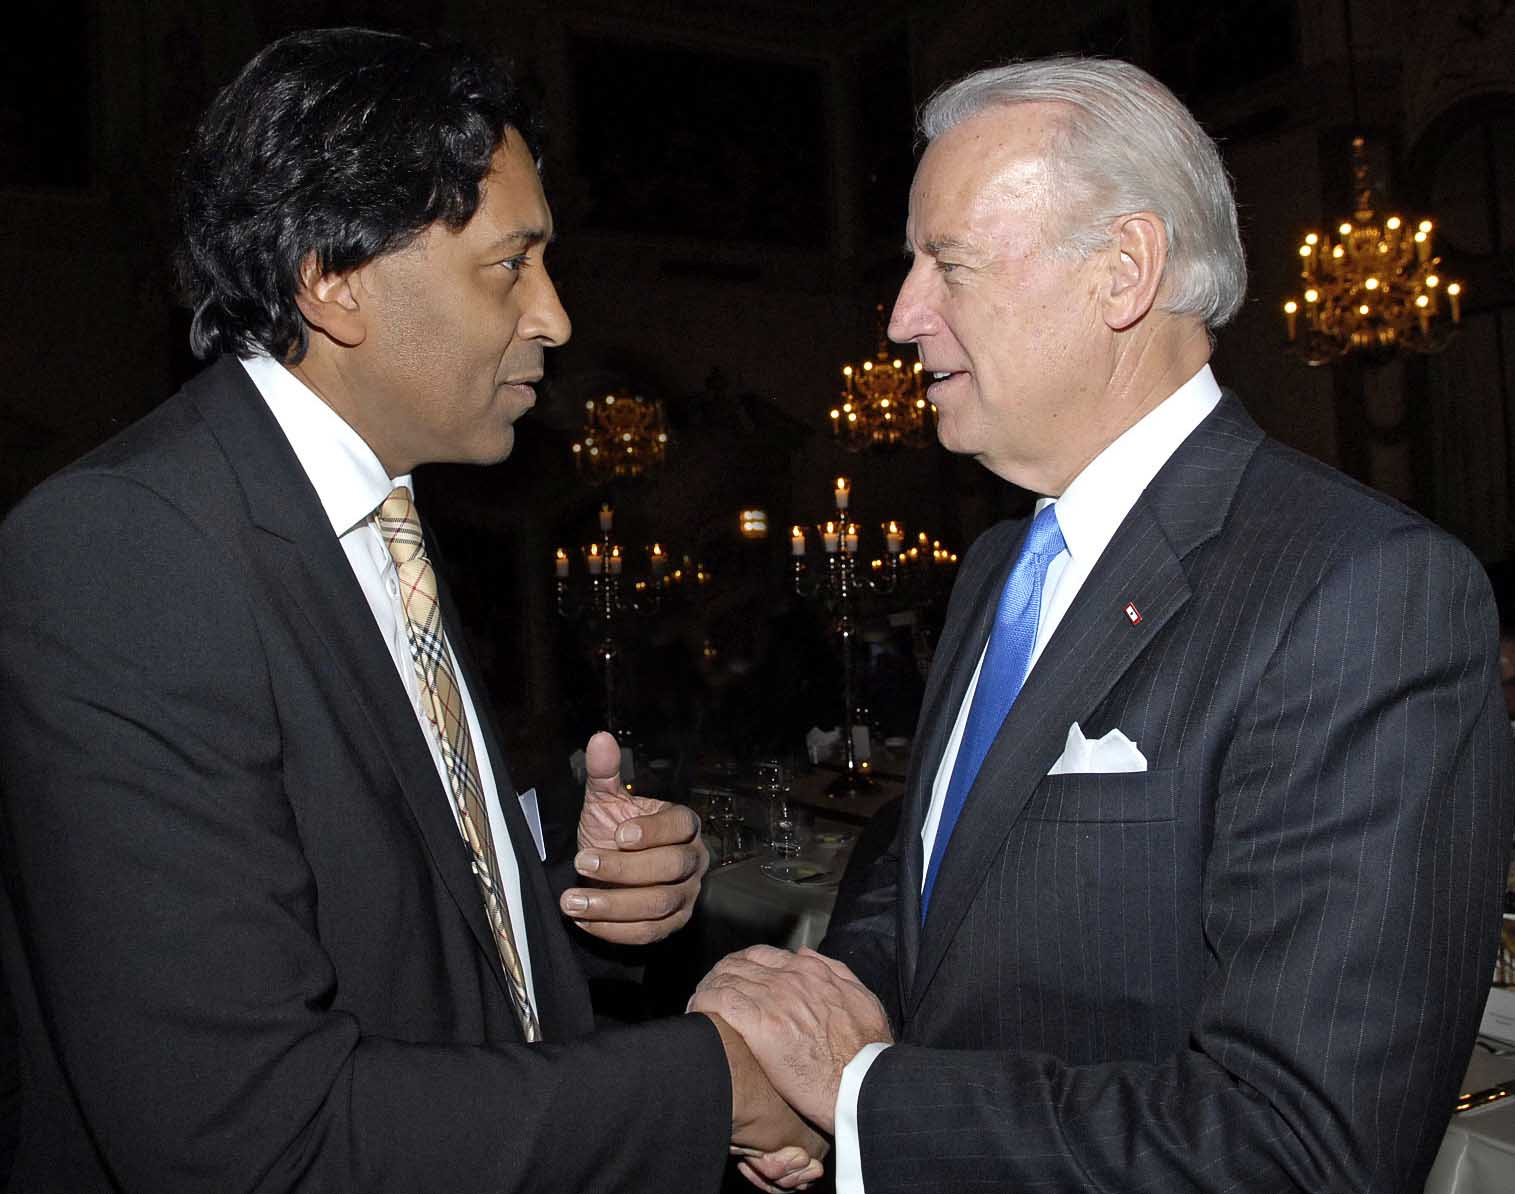 Joe Biden & Cherno Jobatey